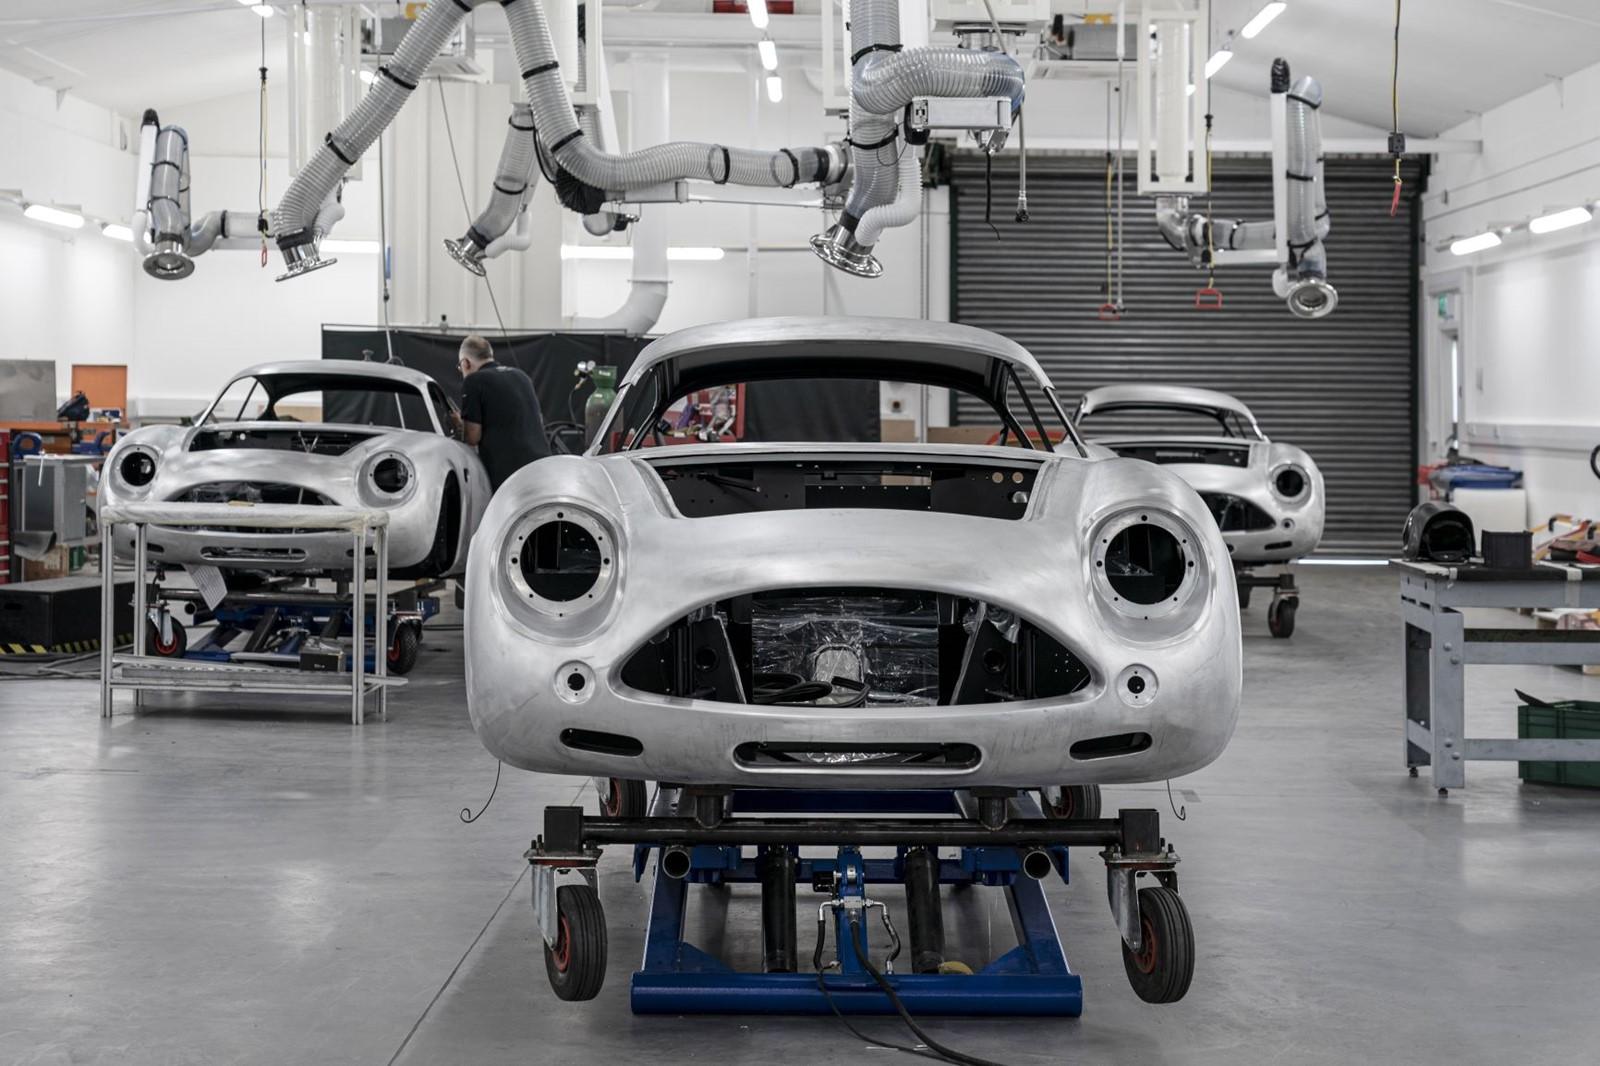 Aston_Martin_DB4GT_Zagato_BuildNewport_Pagnell01-jpg